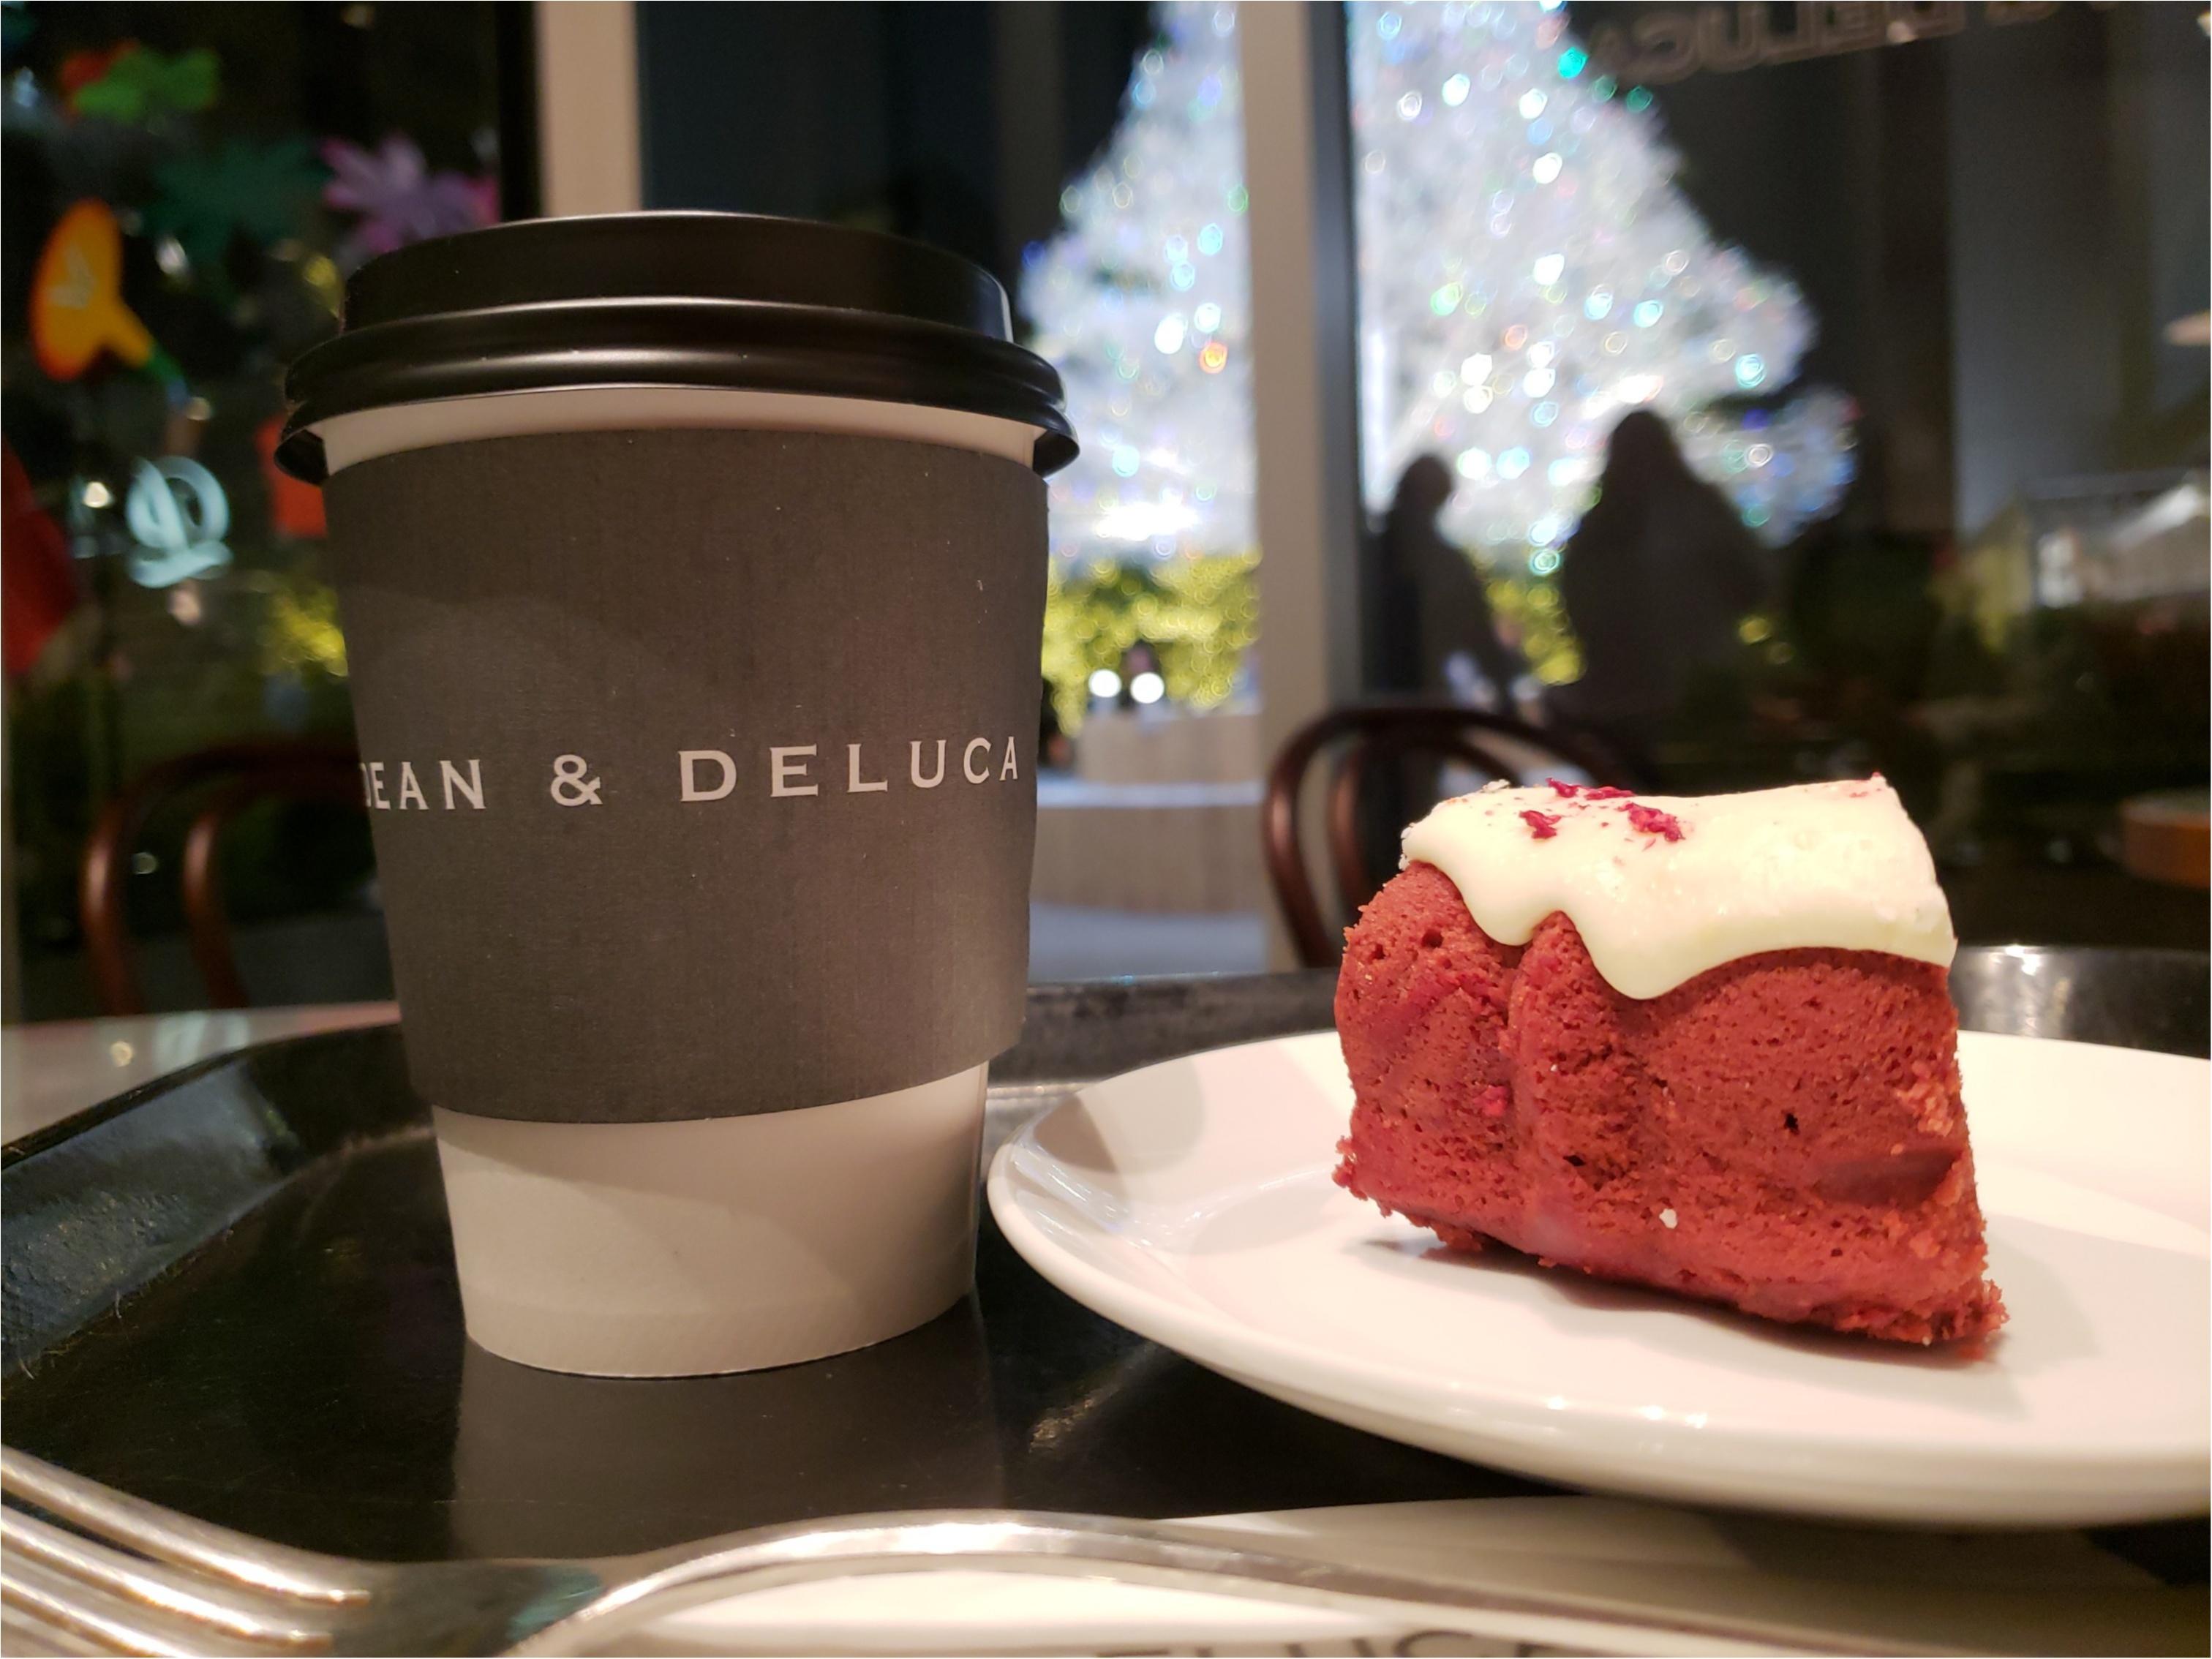 【DEAN&DELUCA】真っ赤なかわいいホリデーケーキ♡_2